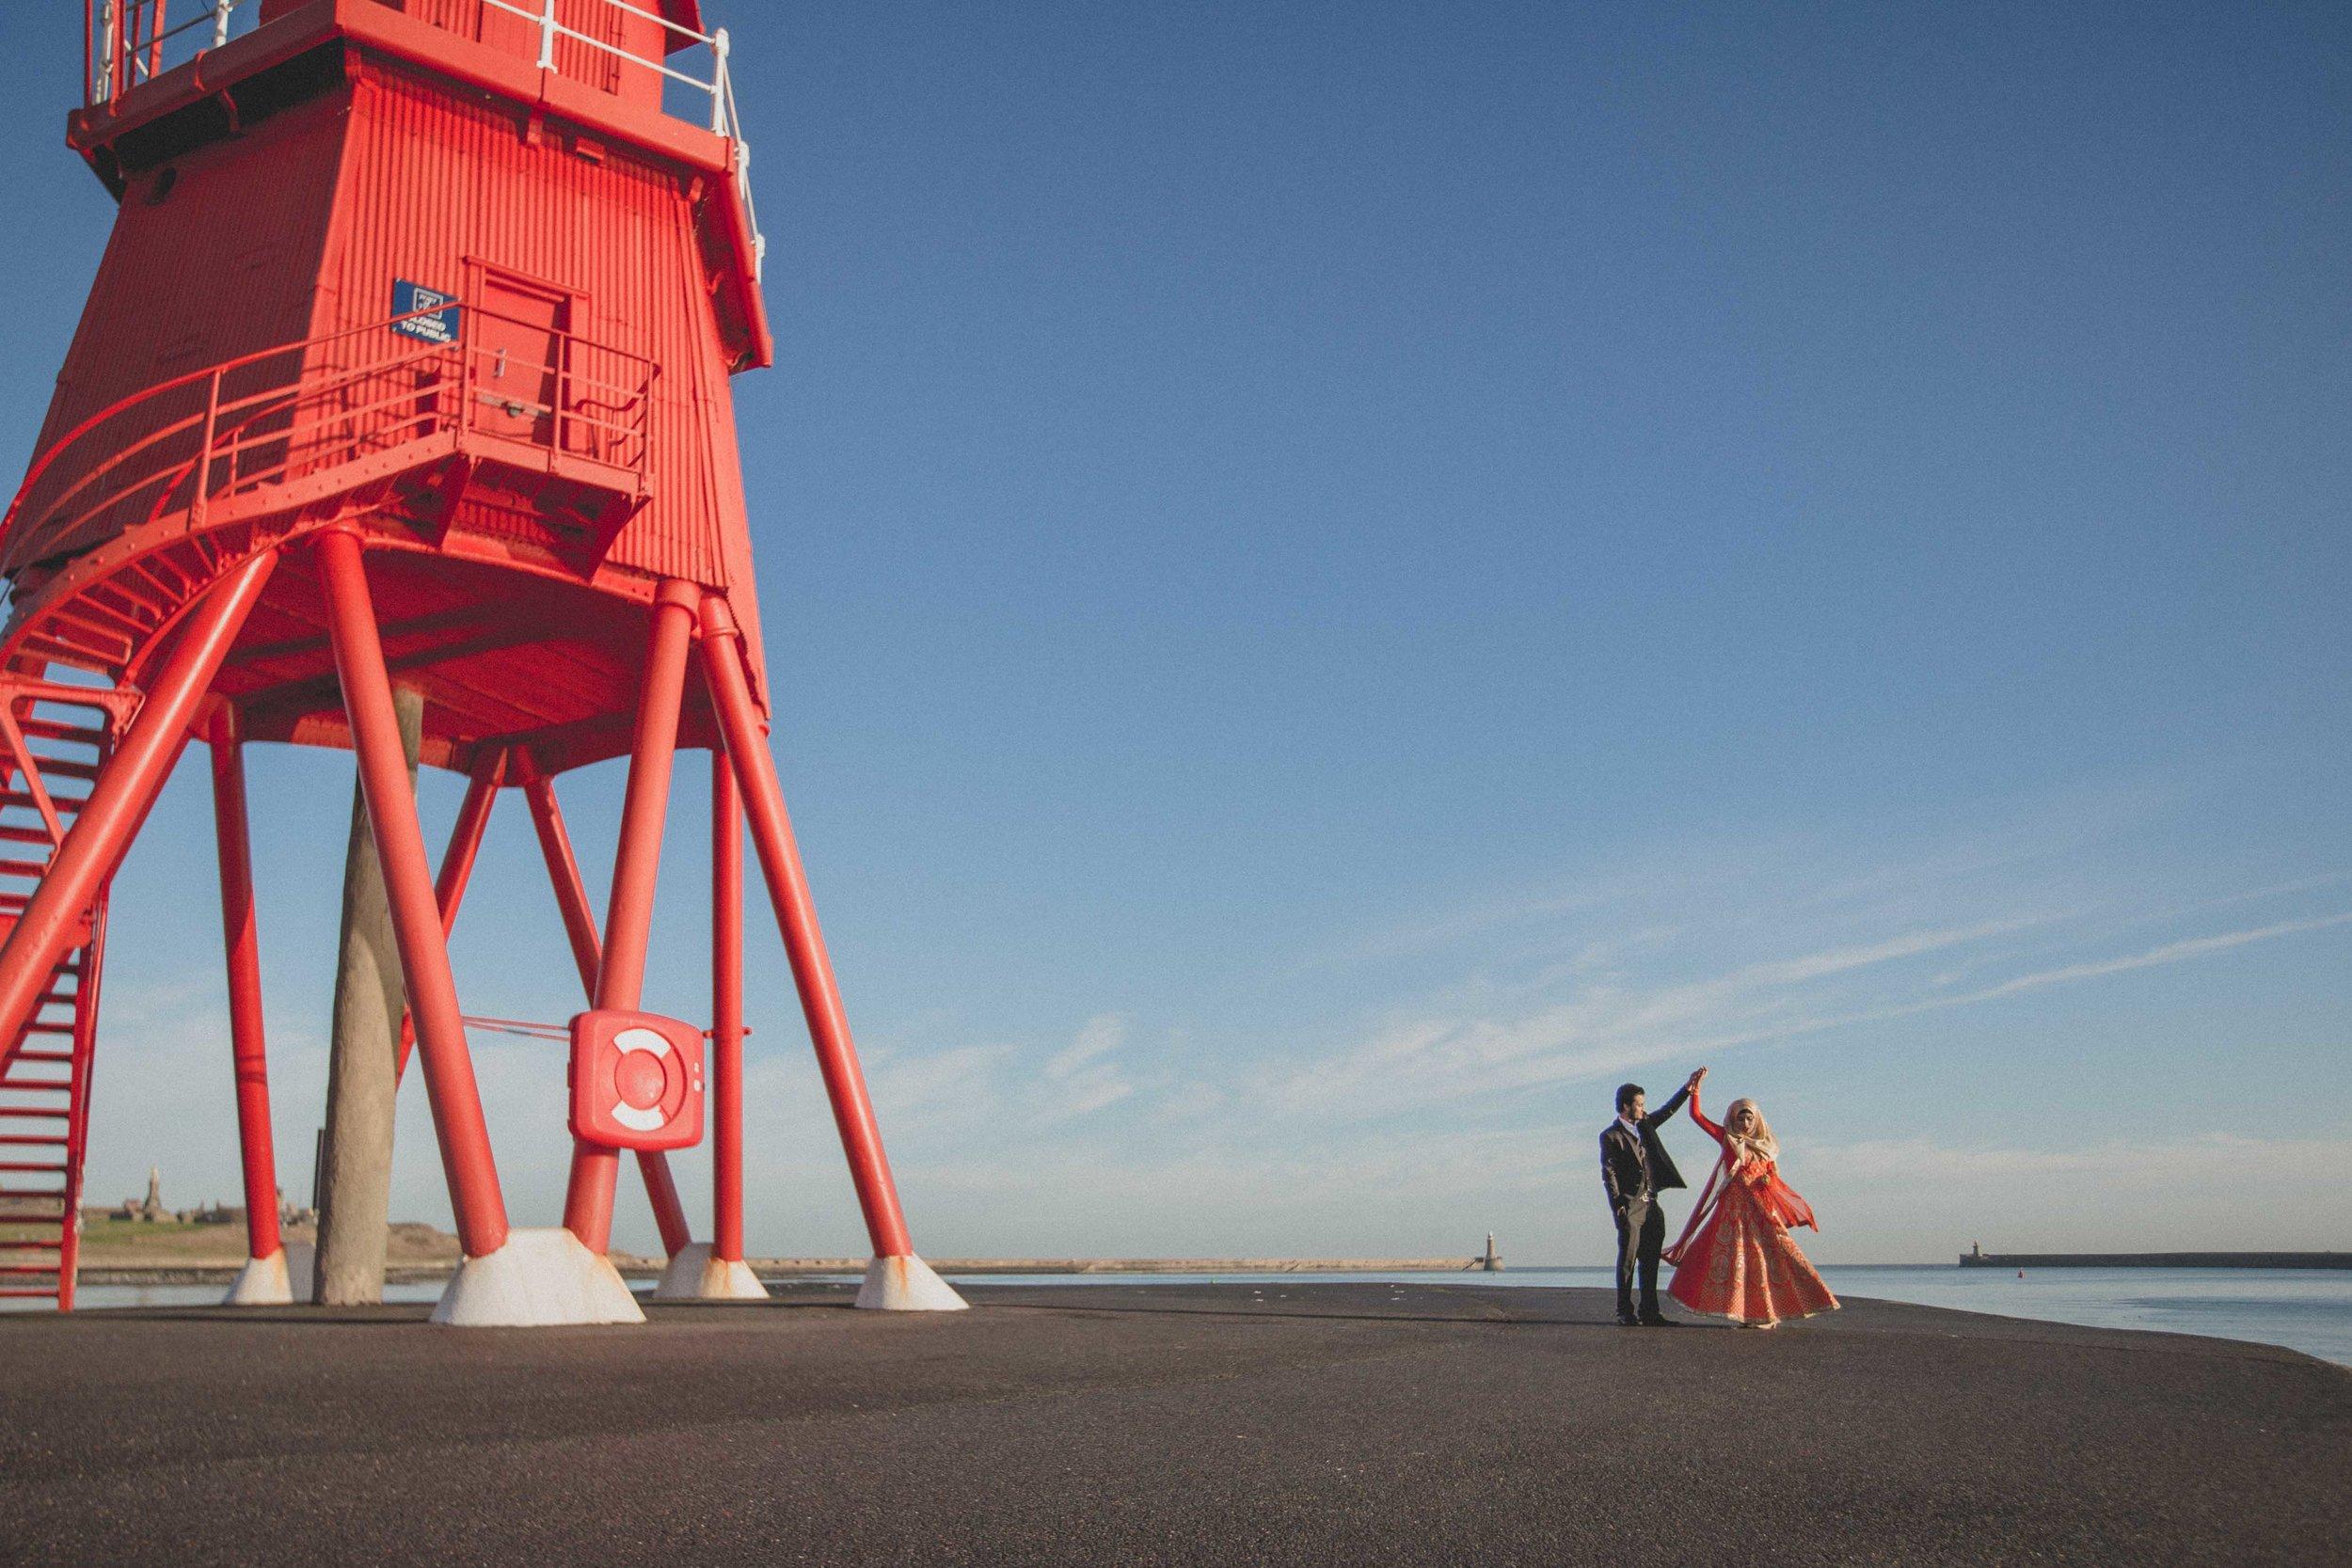 newcastle-beach-lighthouse-couple-prewedding-pre-wedding-shoot-asian-wedding-photographer-natalia-smith-photography-15.jpg